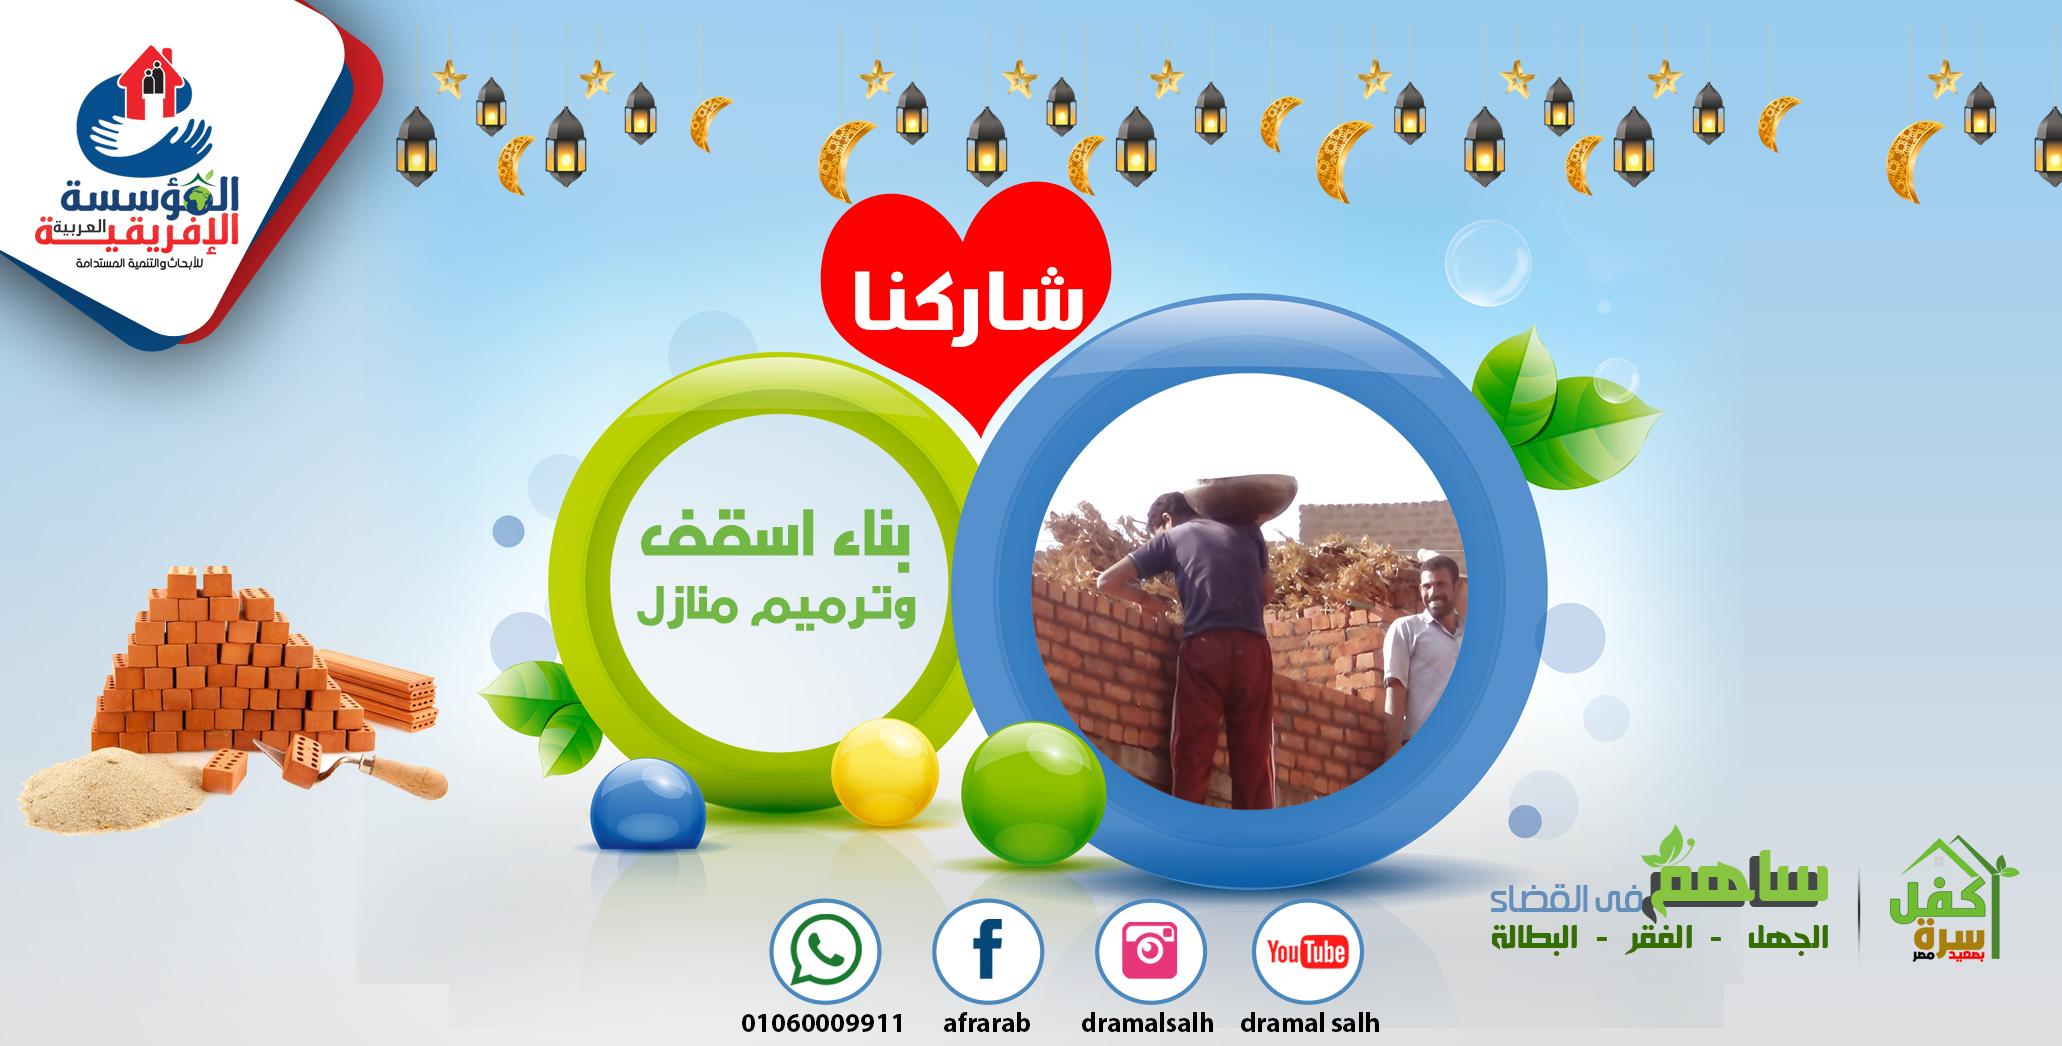 Photo of شاركنا فى بناء اسقف وترميم منازل